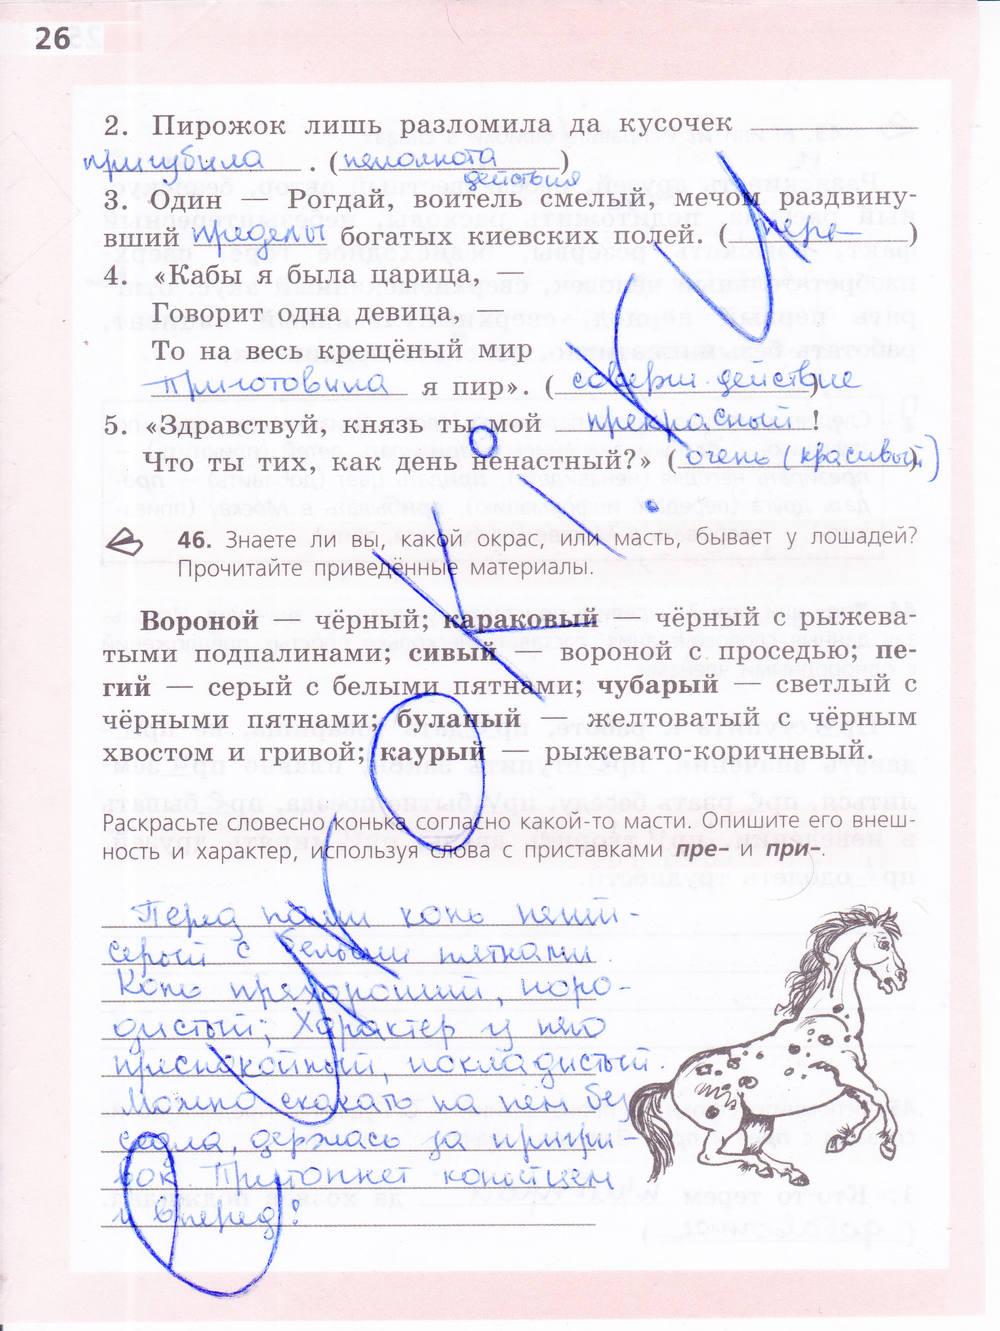 ефремова 6 гдз класс русскому по